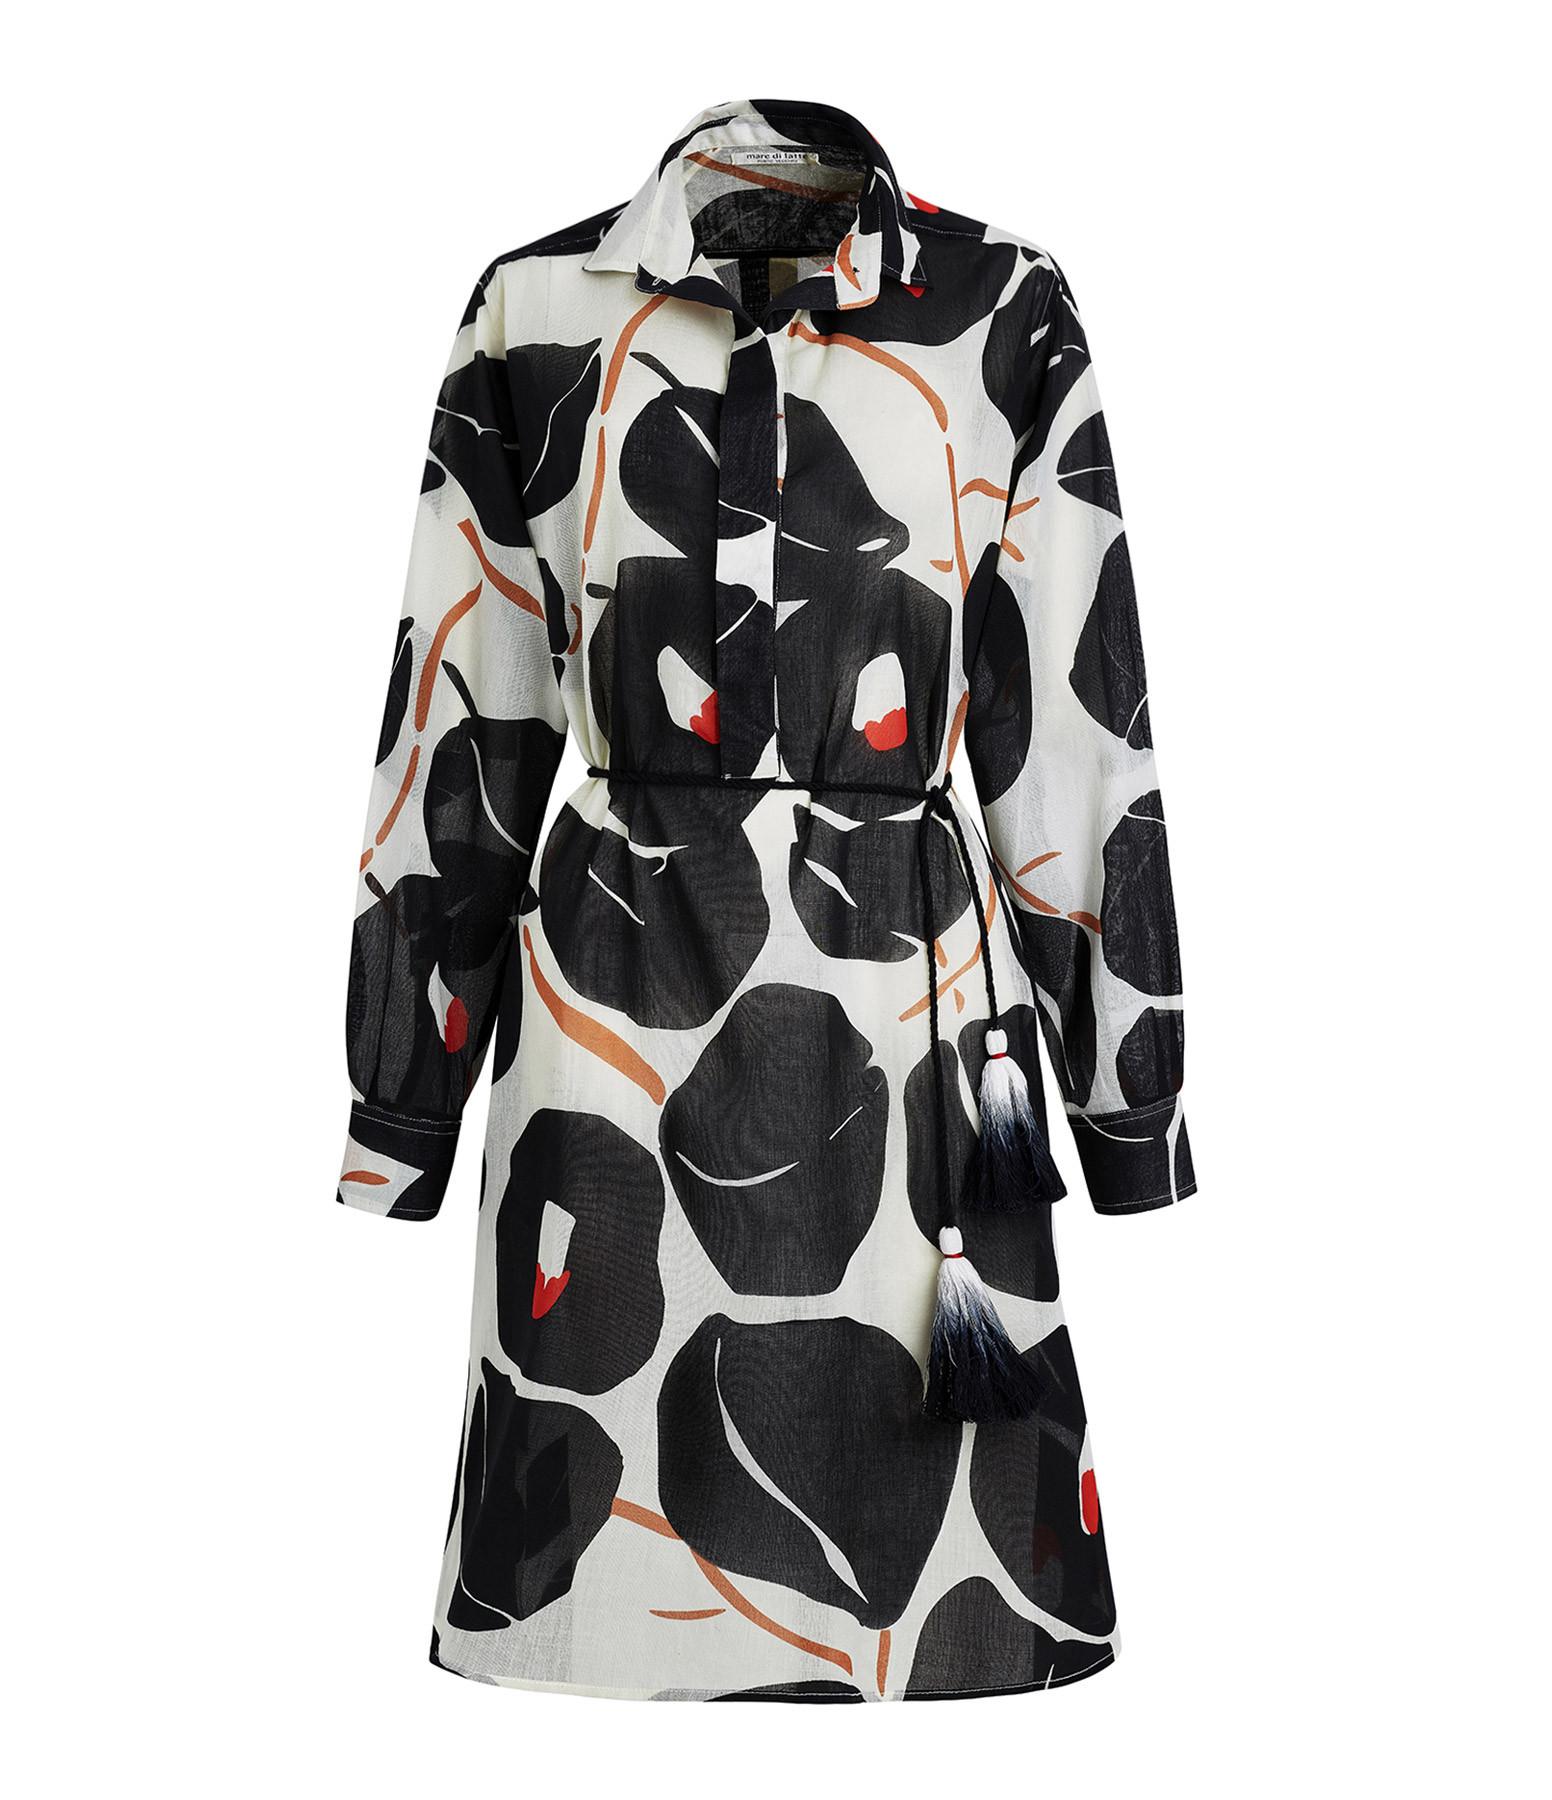 MARE DI LATTE - Robe Adea Coton Noir Imprimé Œillets